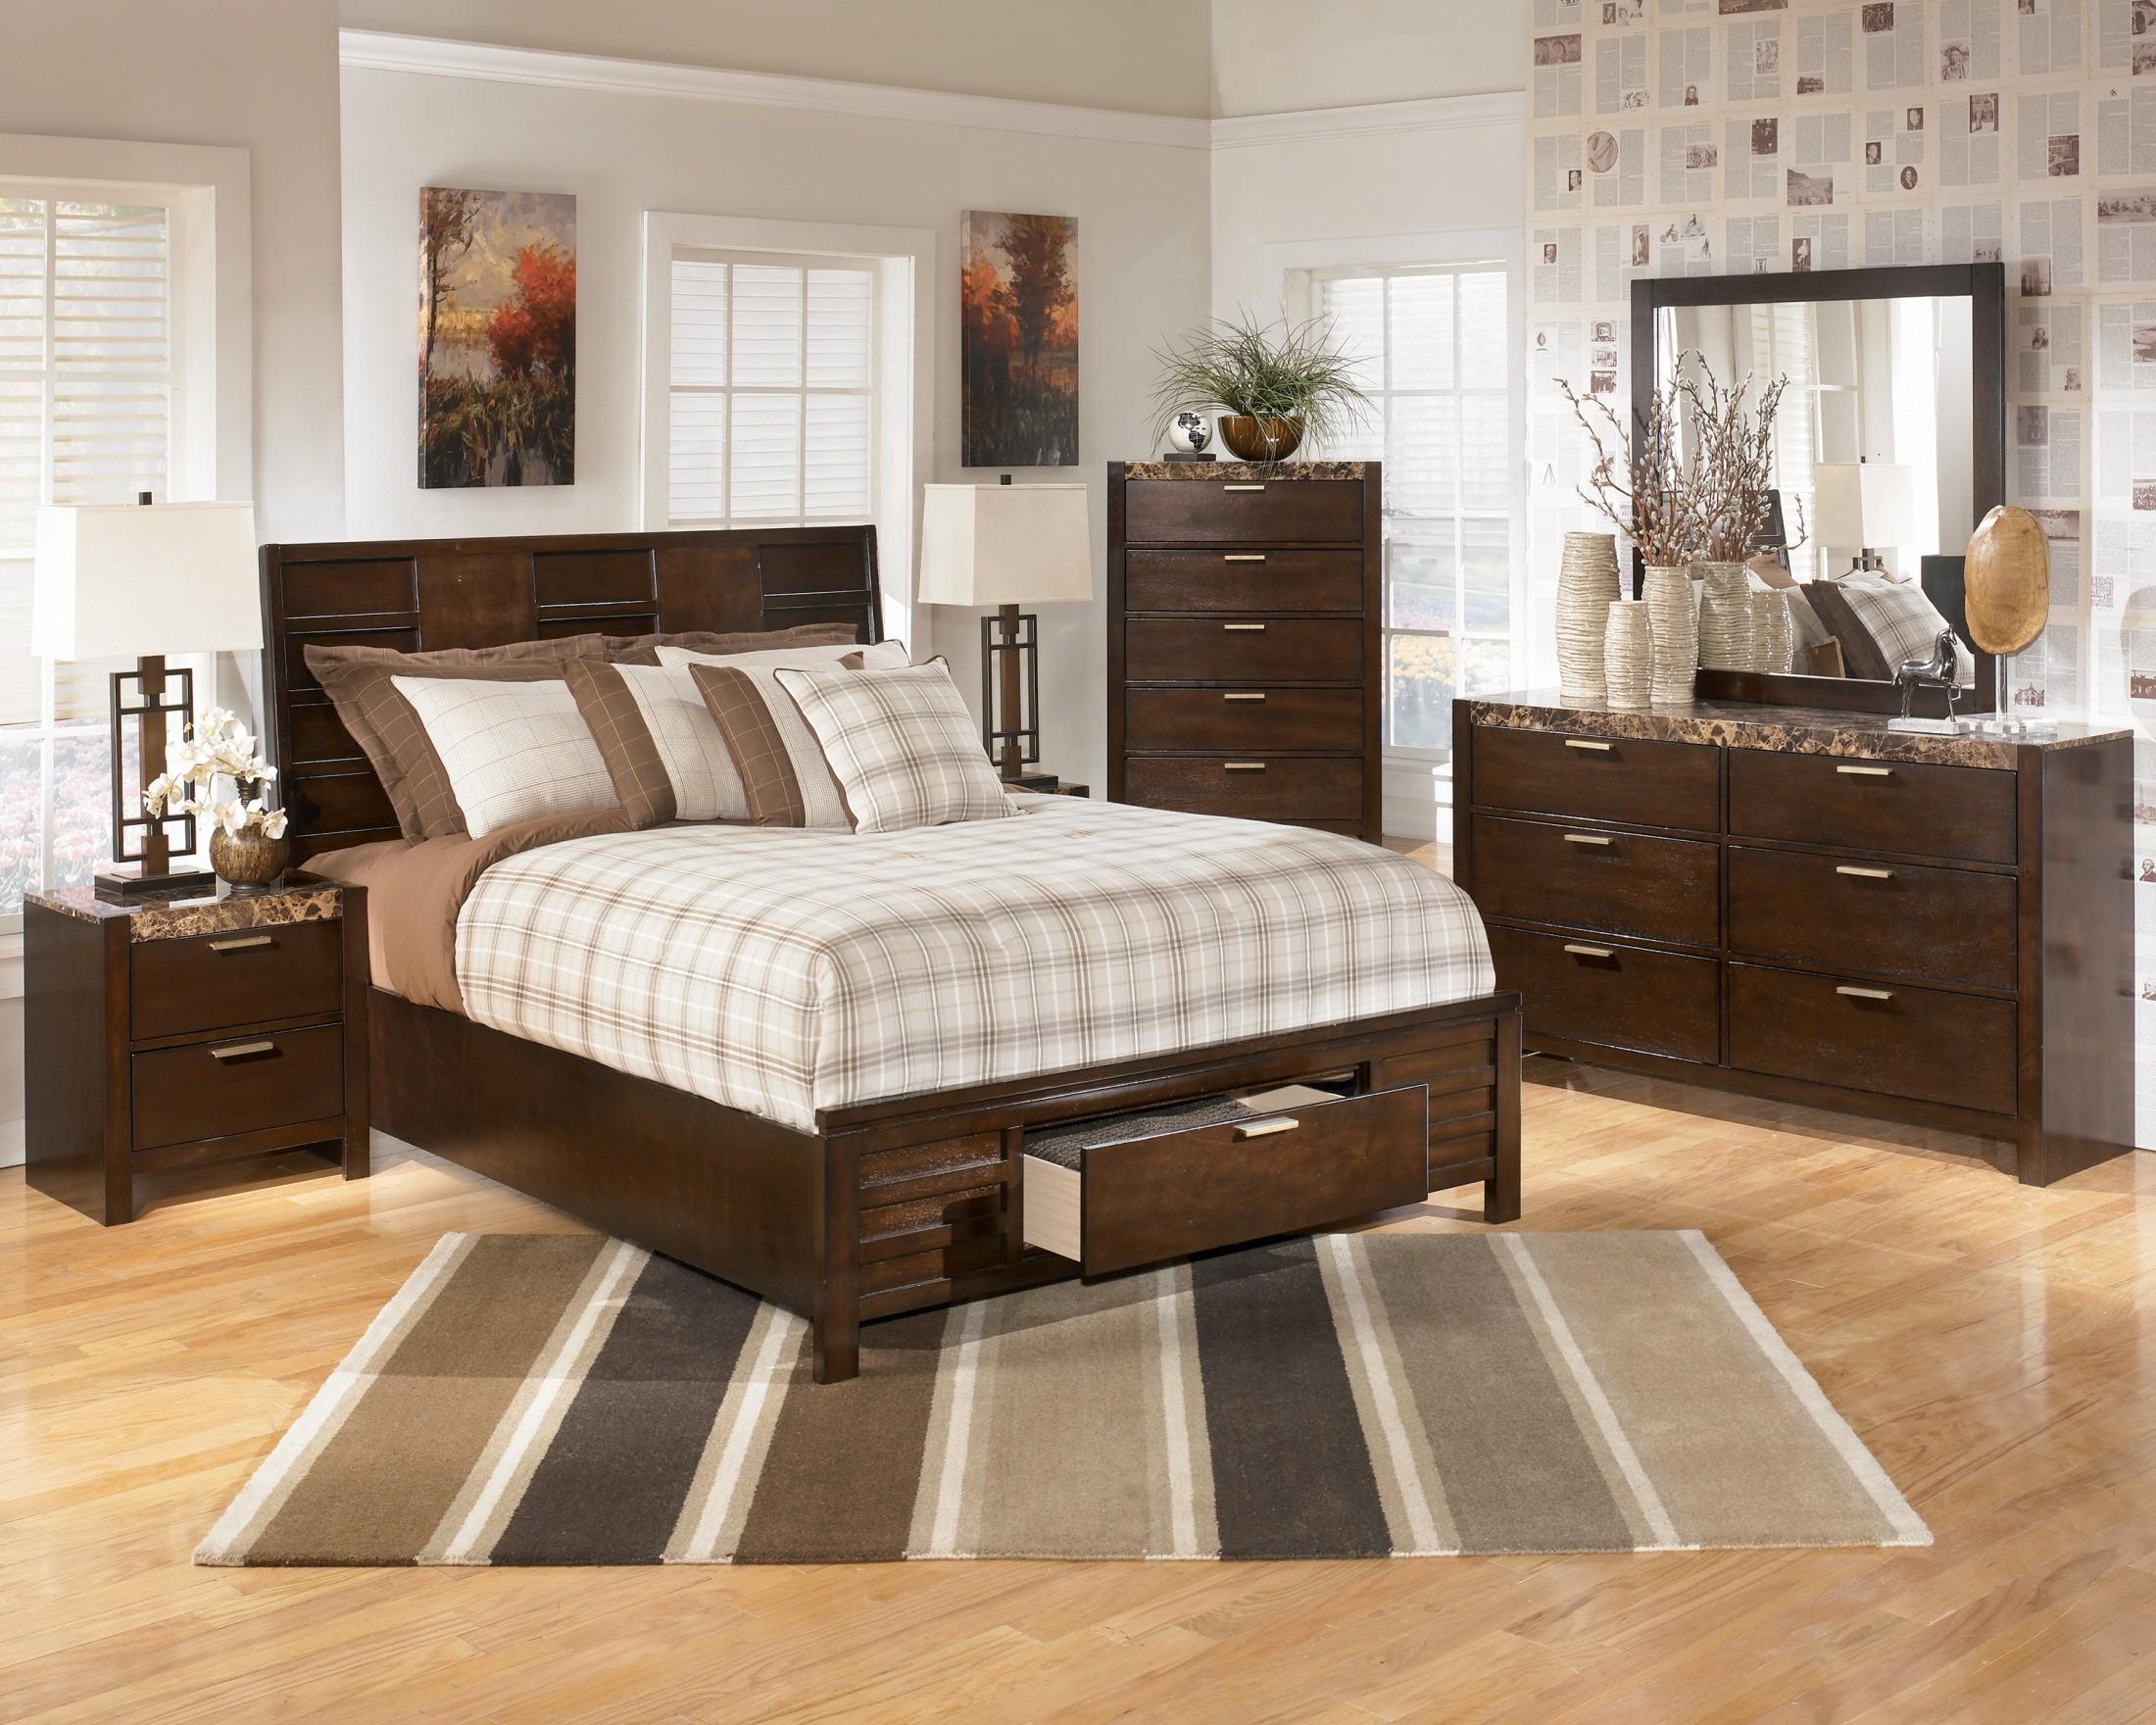 small bedroom furniture arrangement ideas photo - 10